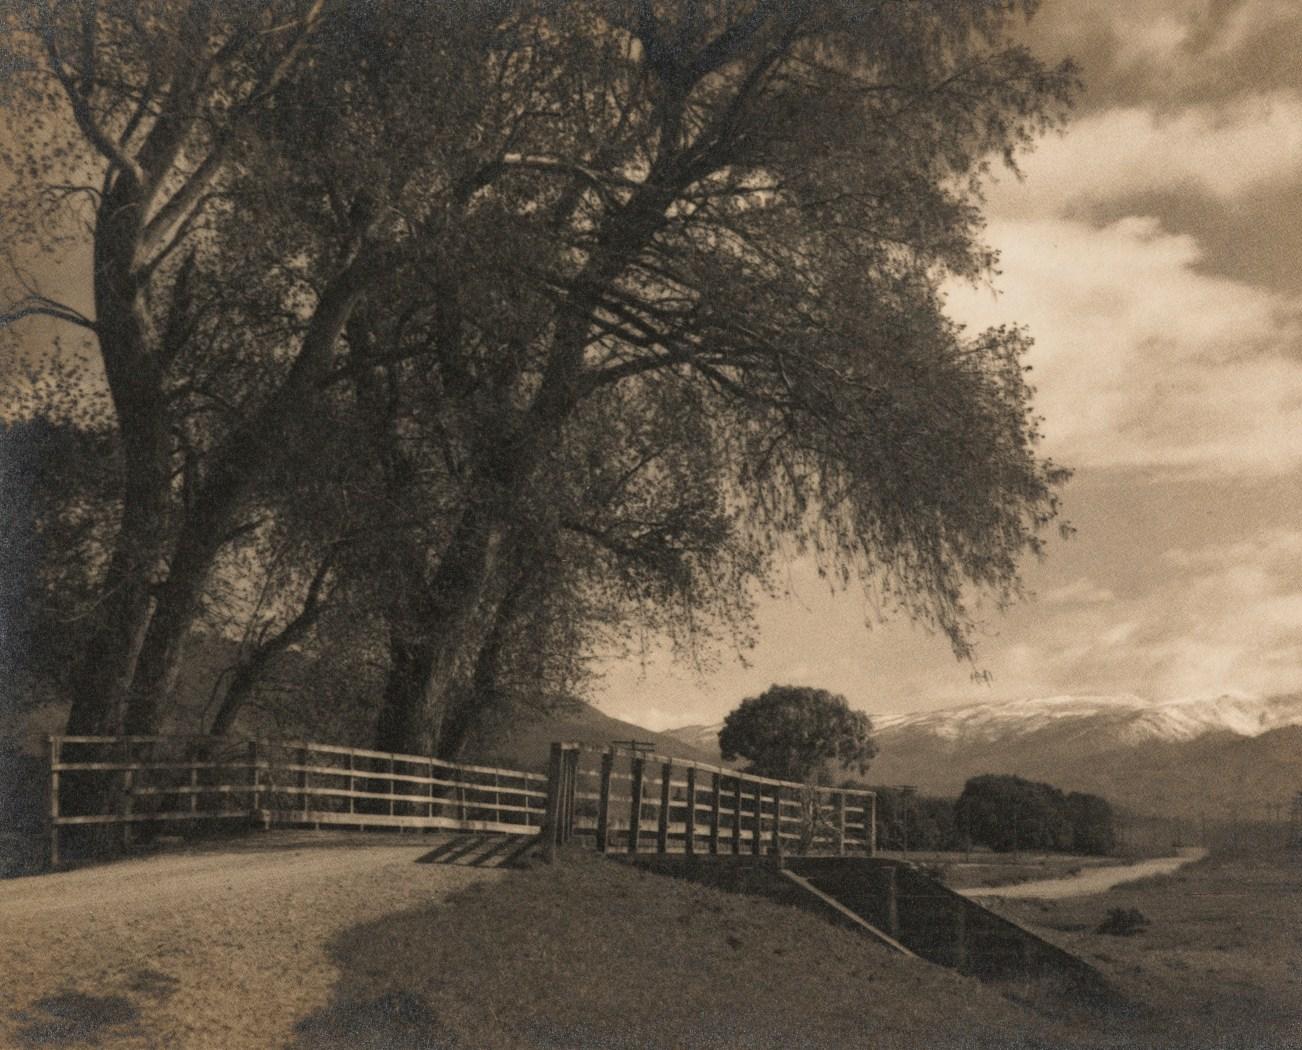 TePapa Near Earnsleugh Otago by George Chance